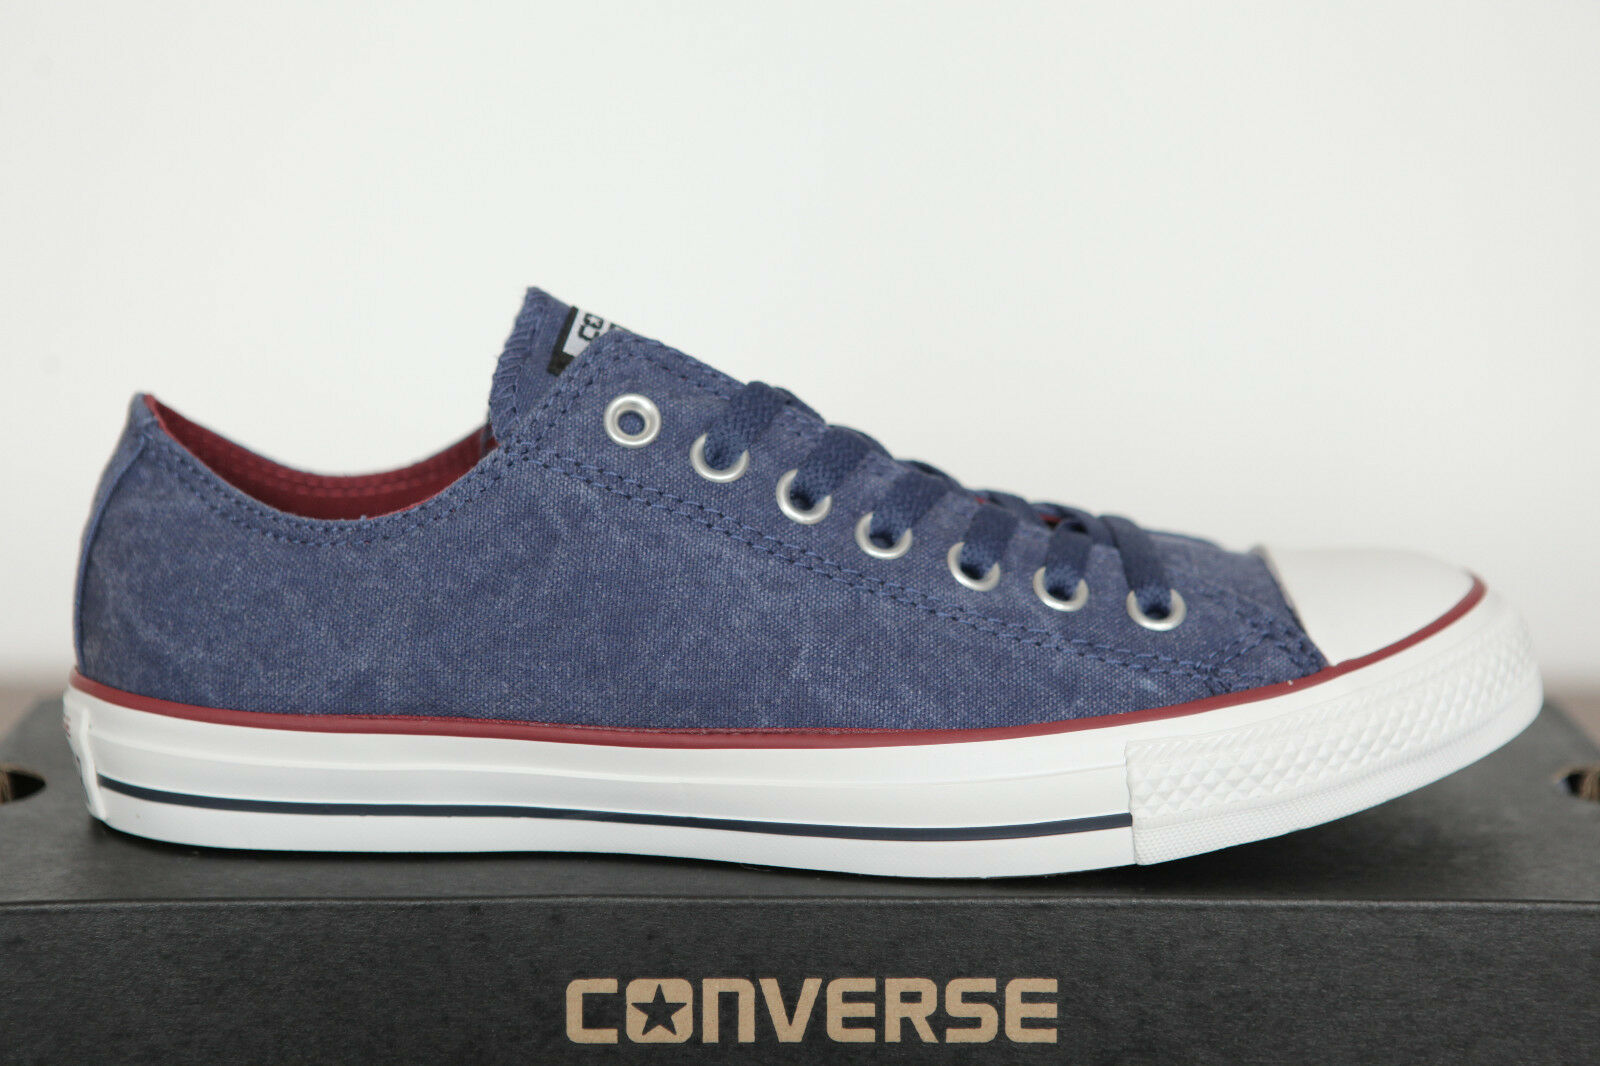 NUOVO ALL STAR CONVERSE Chucks Low Can 142235c Sneakers ensign blu lavato 142235c Can 37 TGL b44899